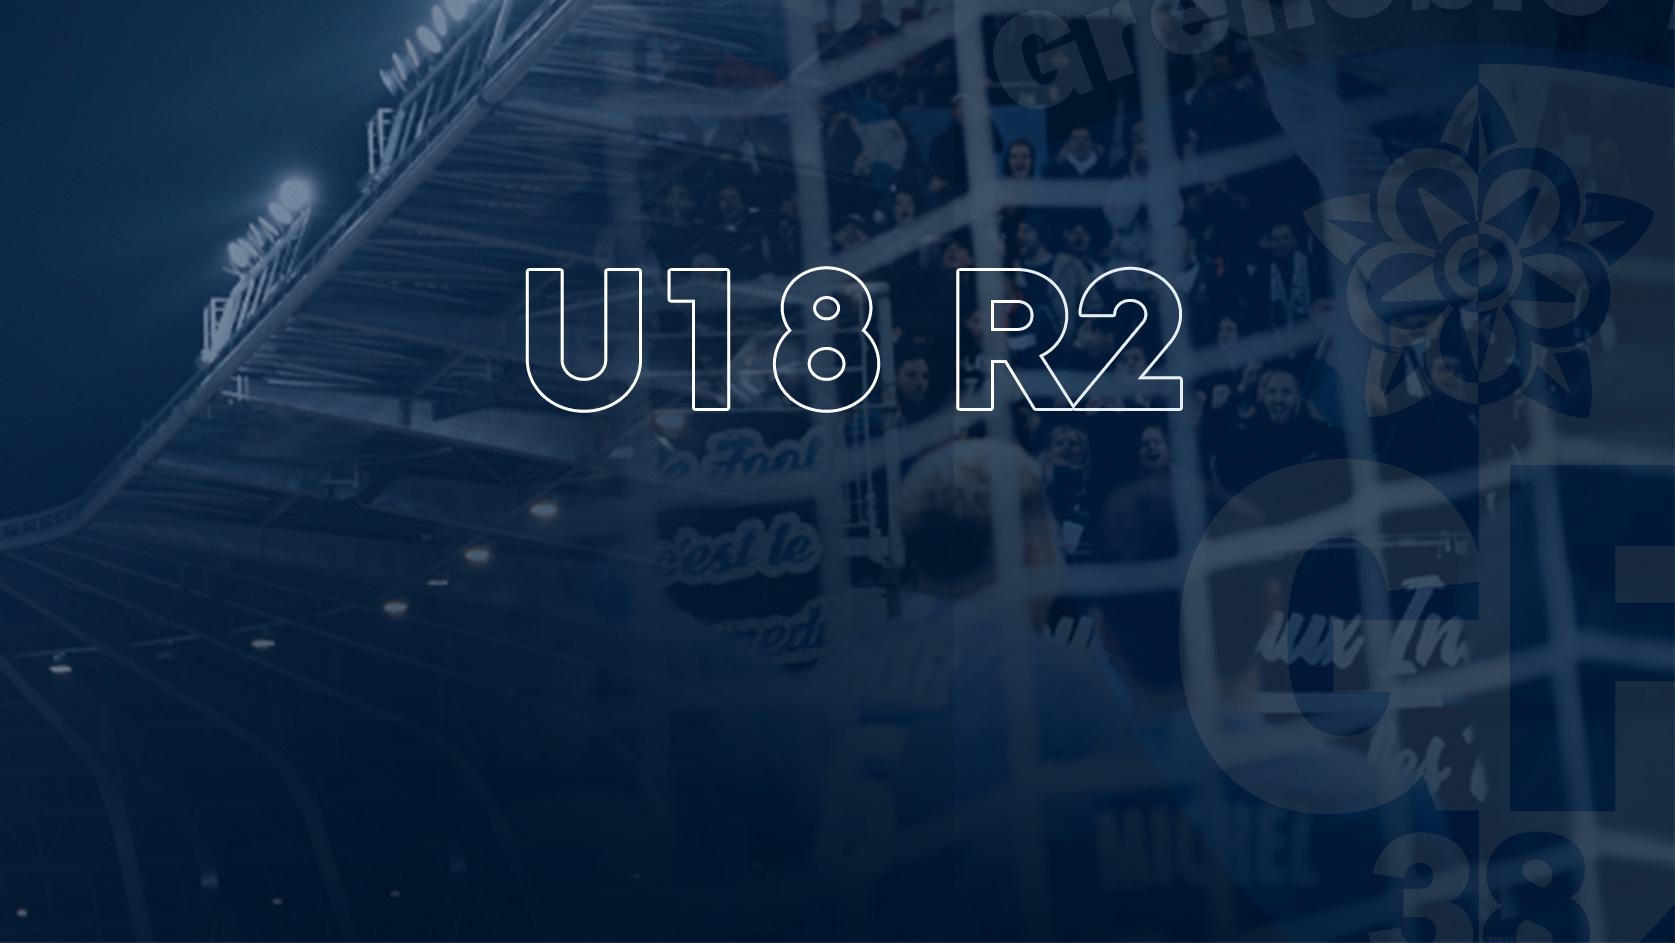 U18 R2